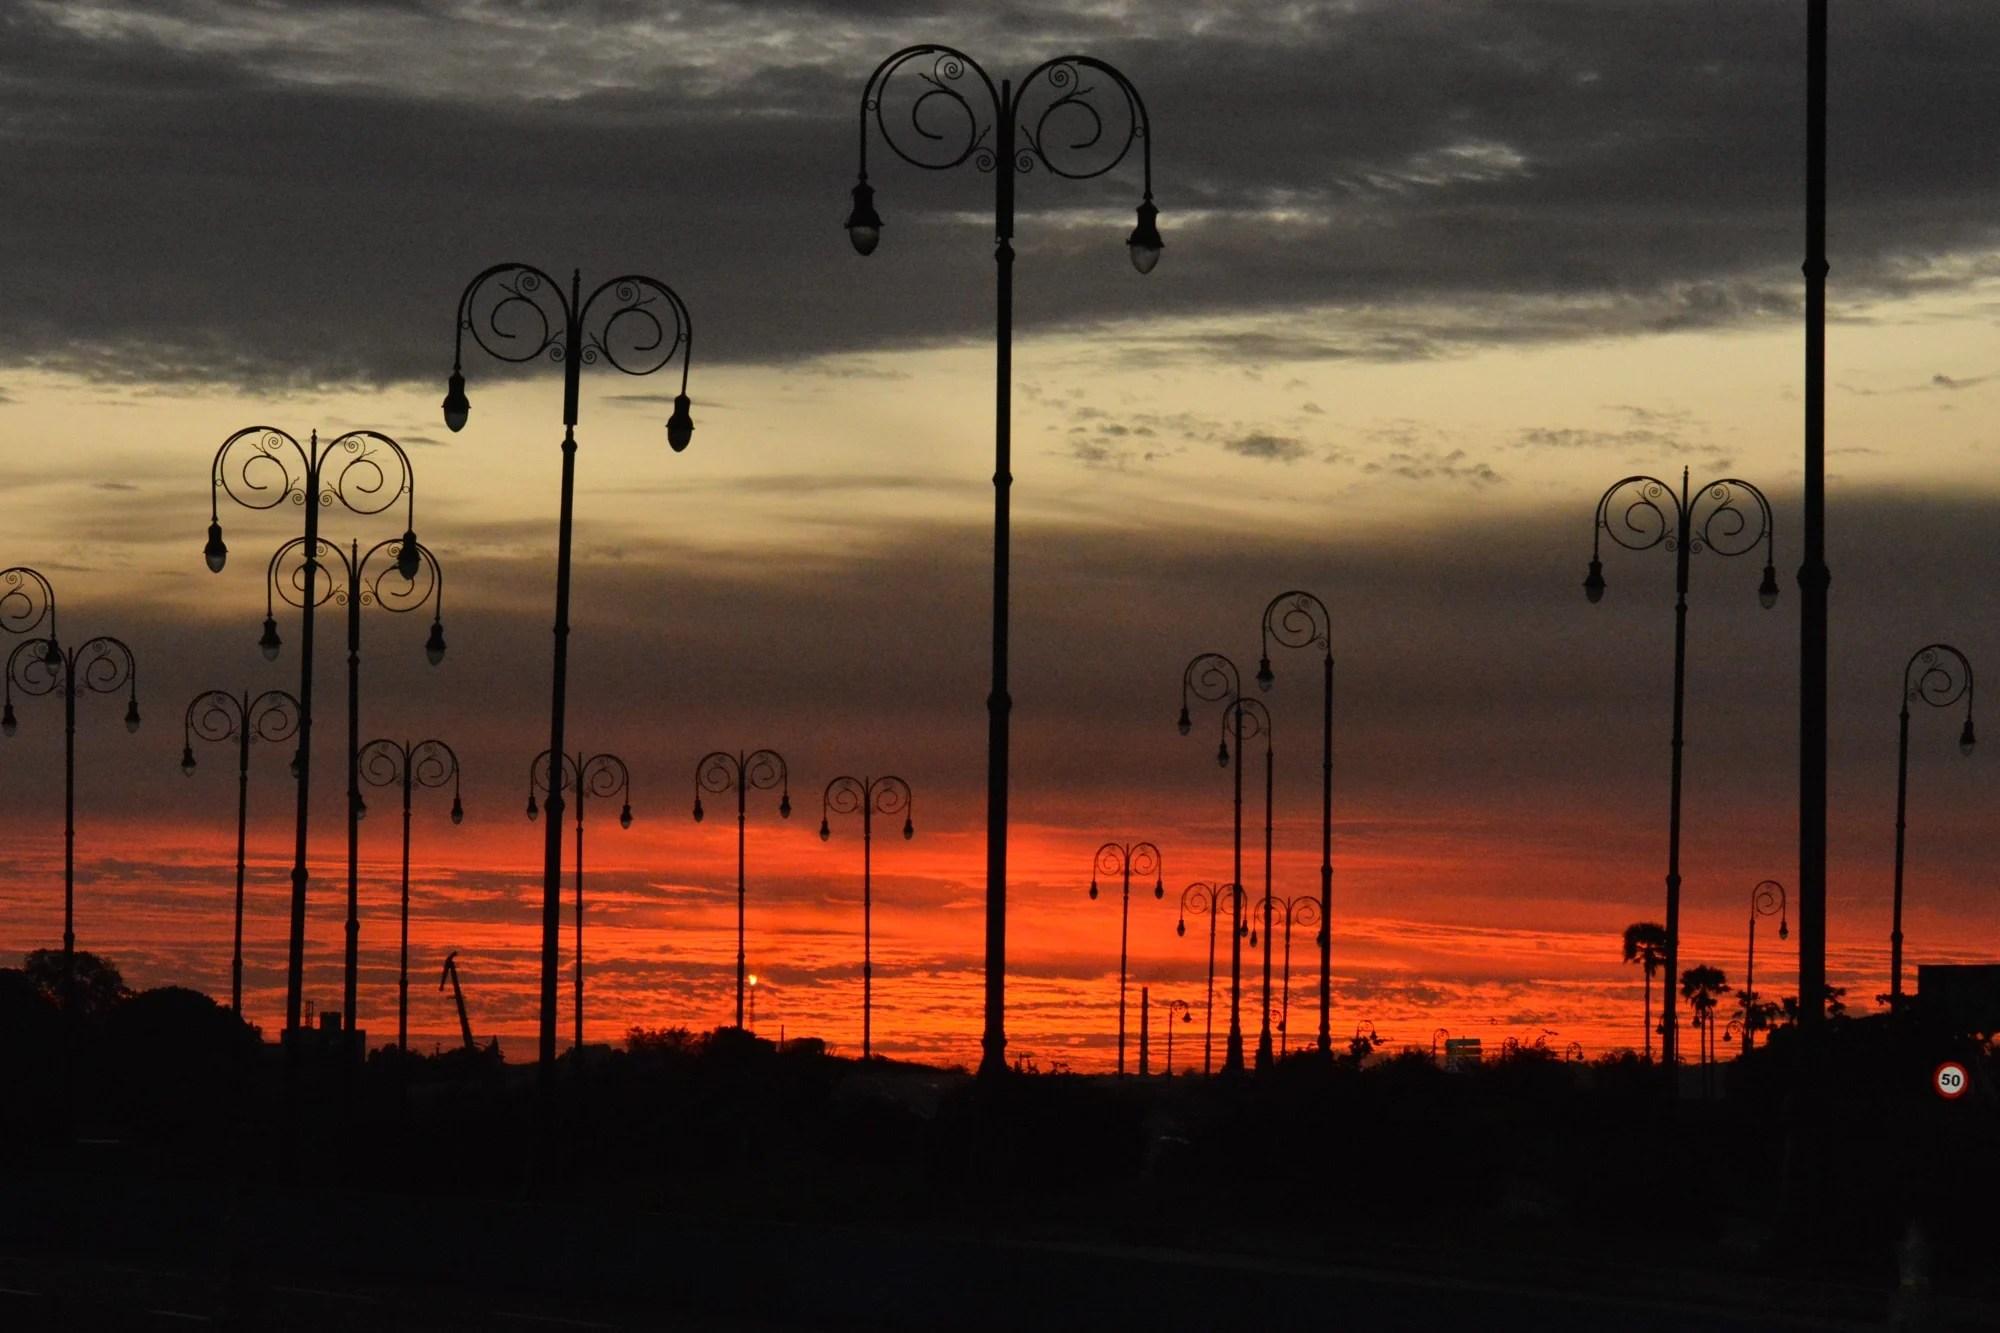 jkochanowski_2.jpeg A New Dawn Over Havana